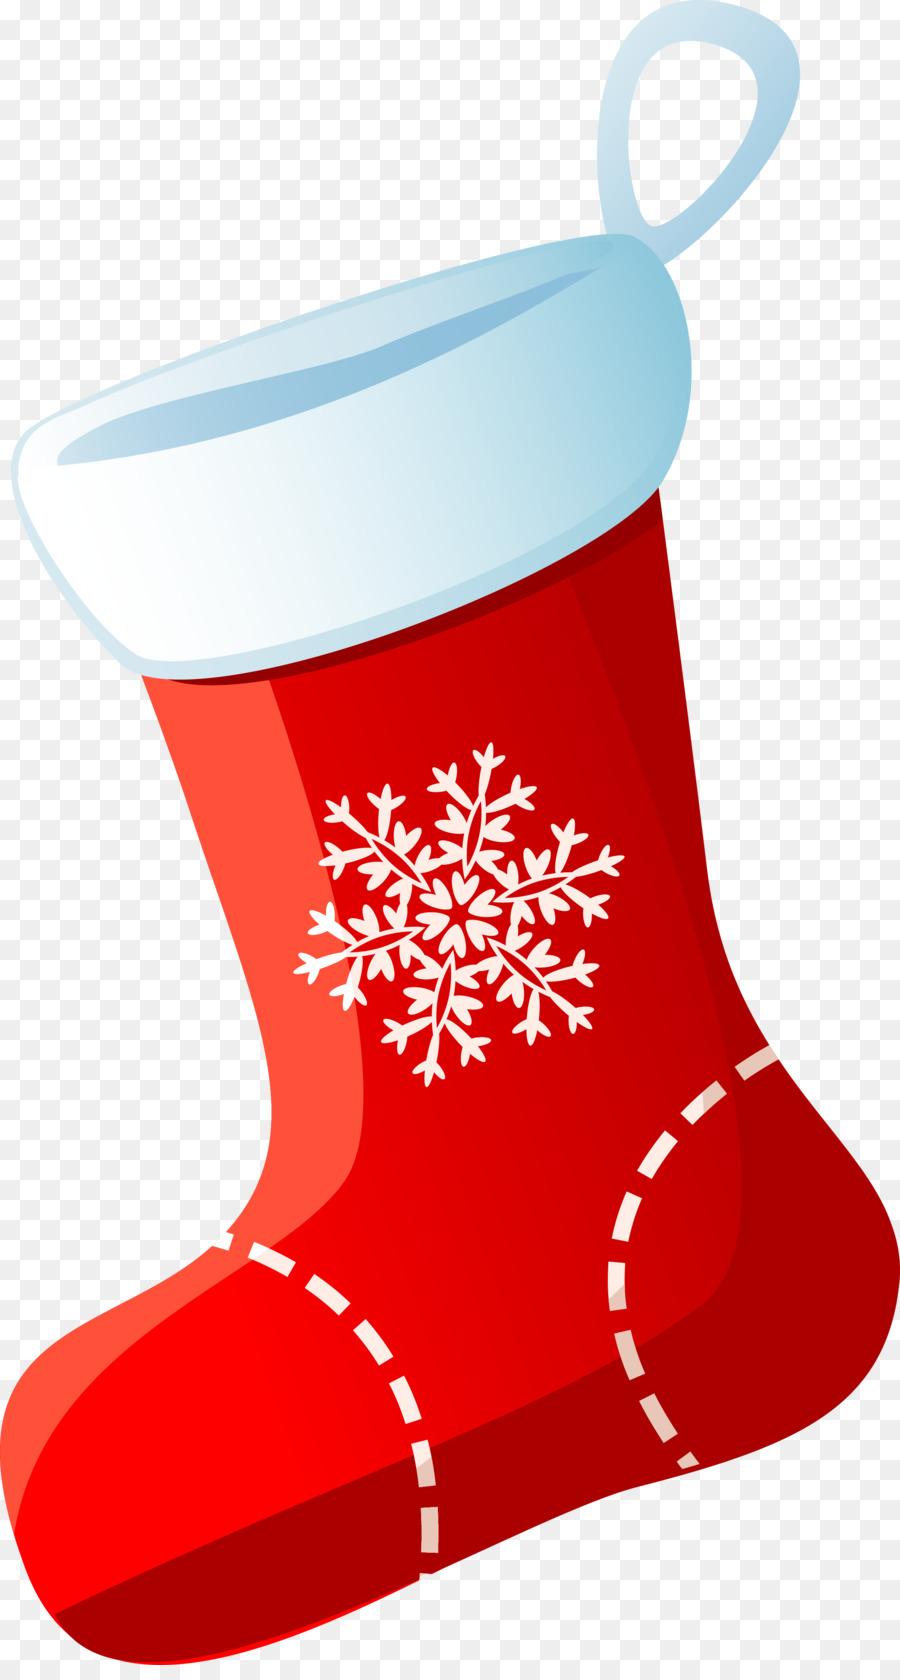 Weihnachten Strümpfe Socke Clip art - Socken png herunterladen ...